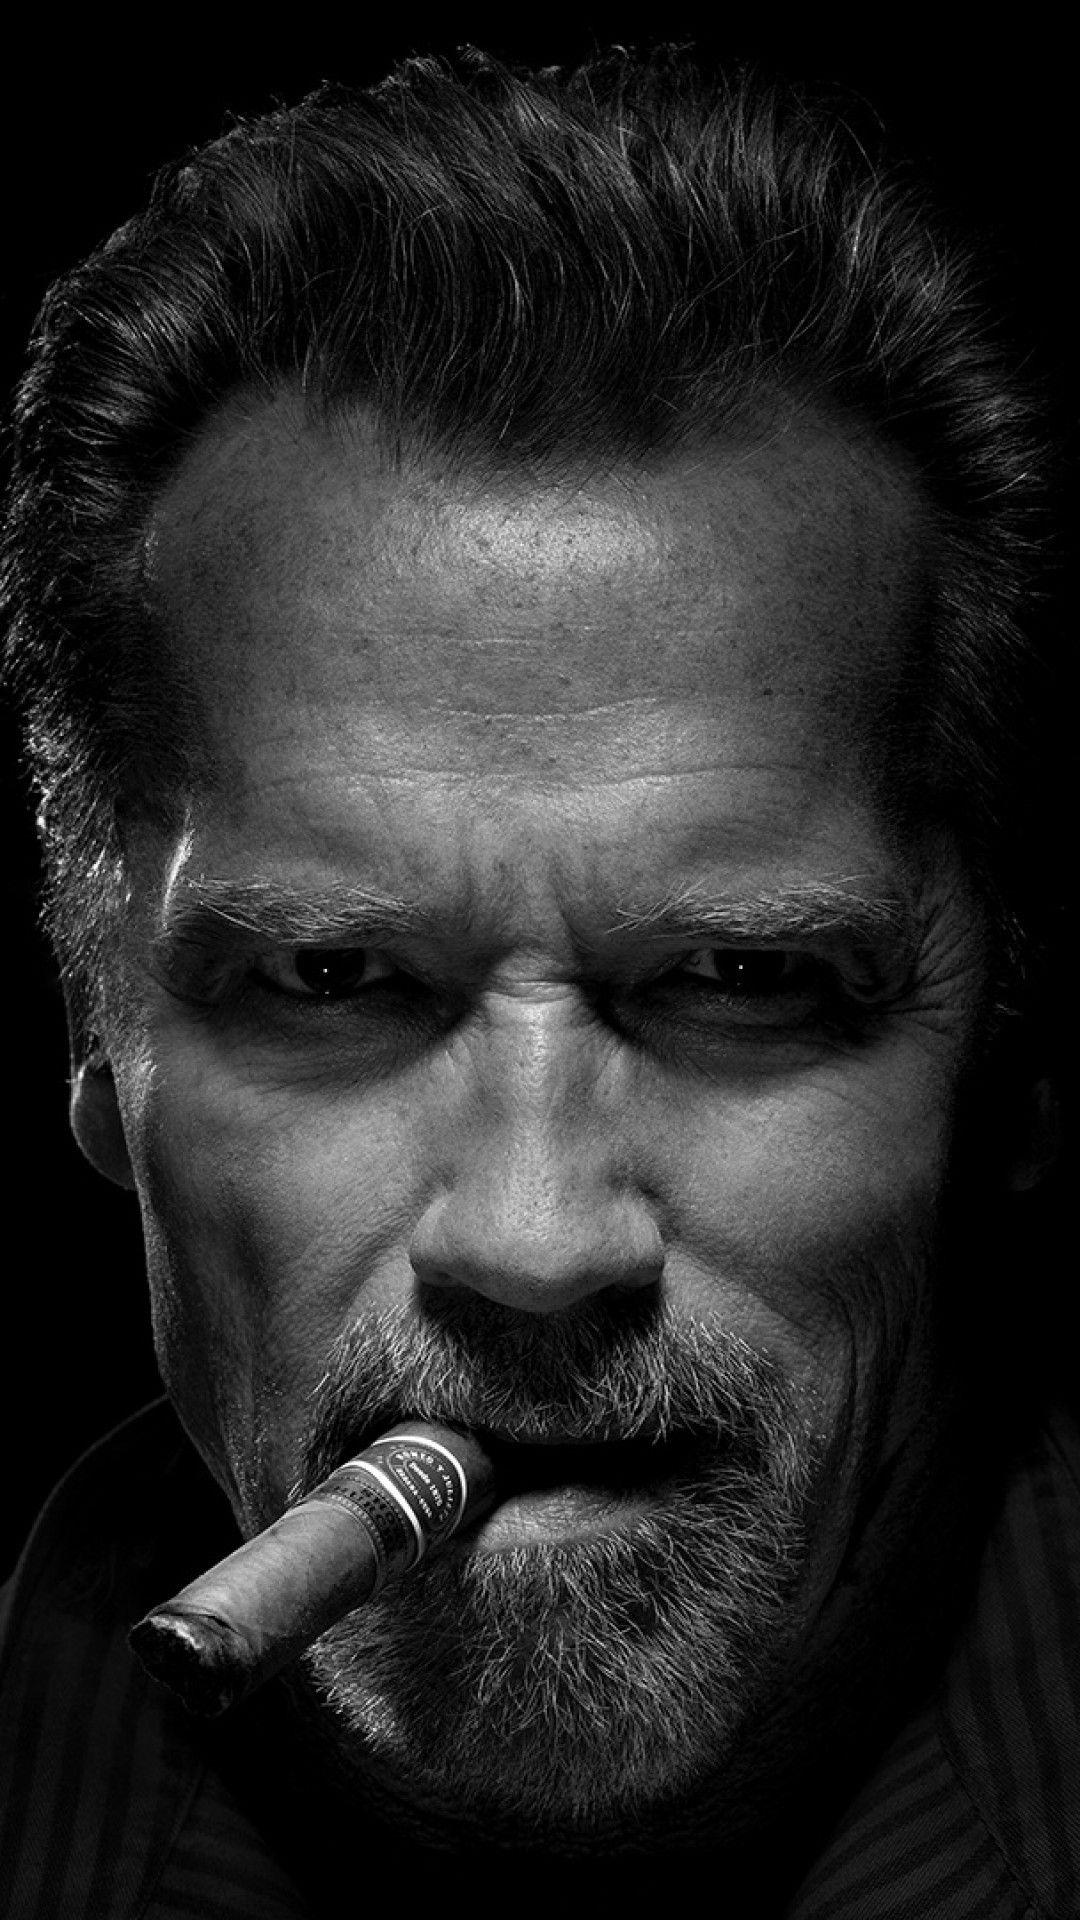 Downloadarnold Schwarzenegger, Actor, Beard, Monochrome, Face Po